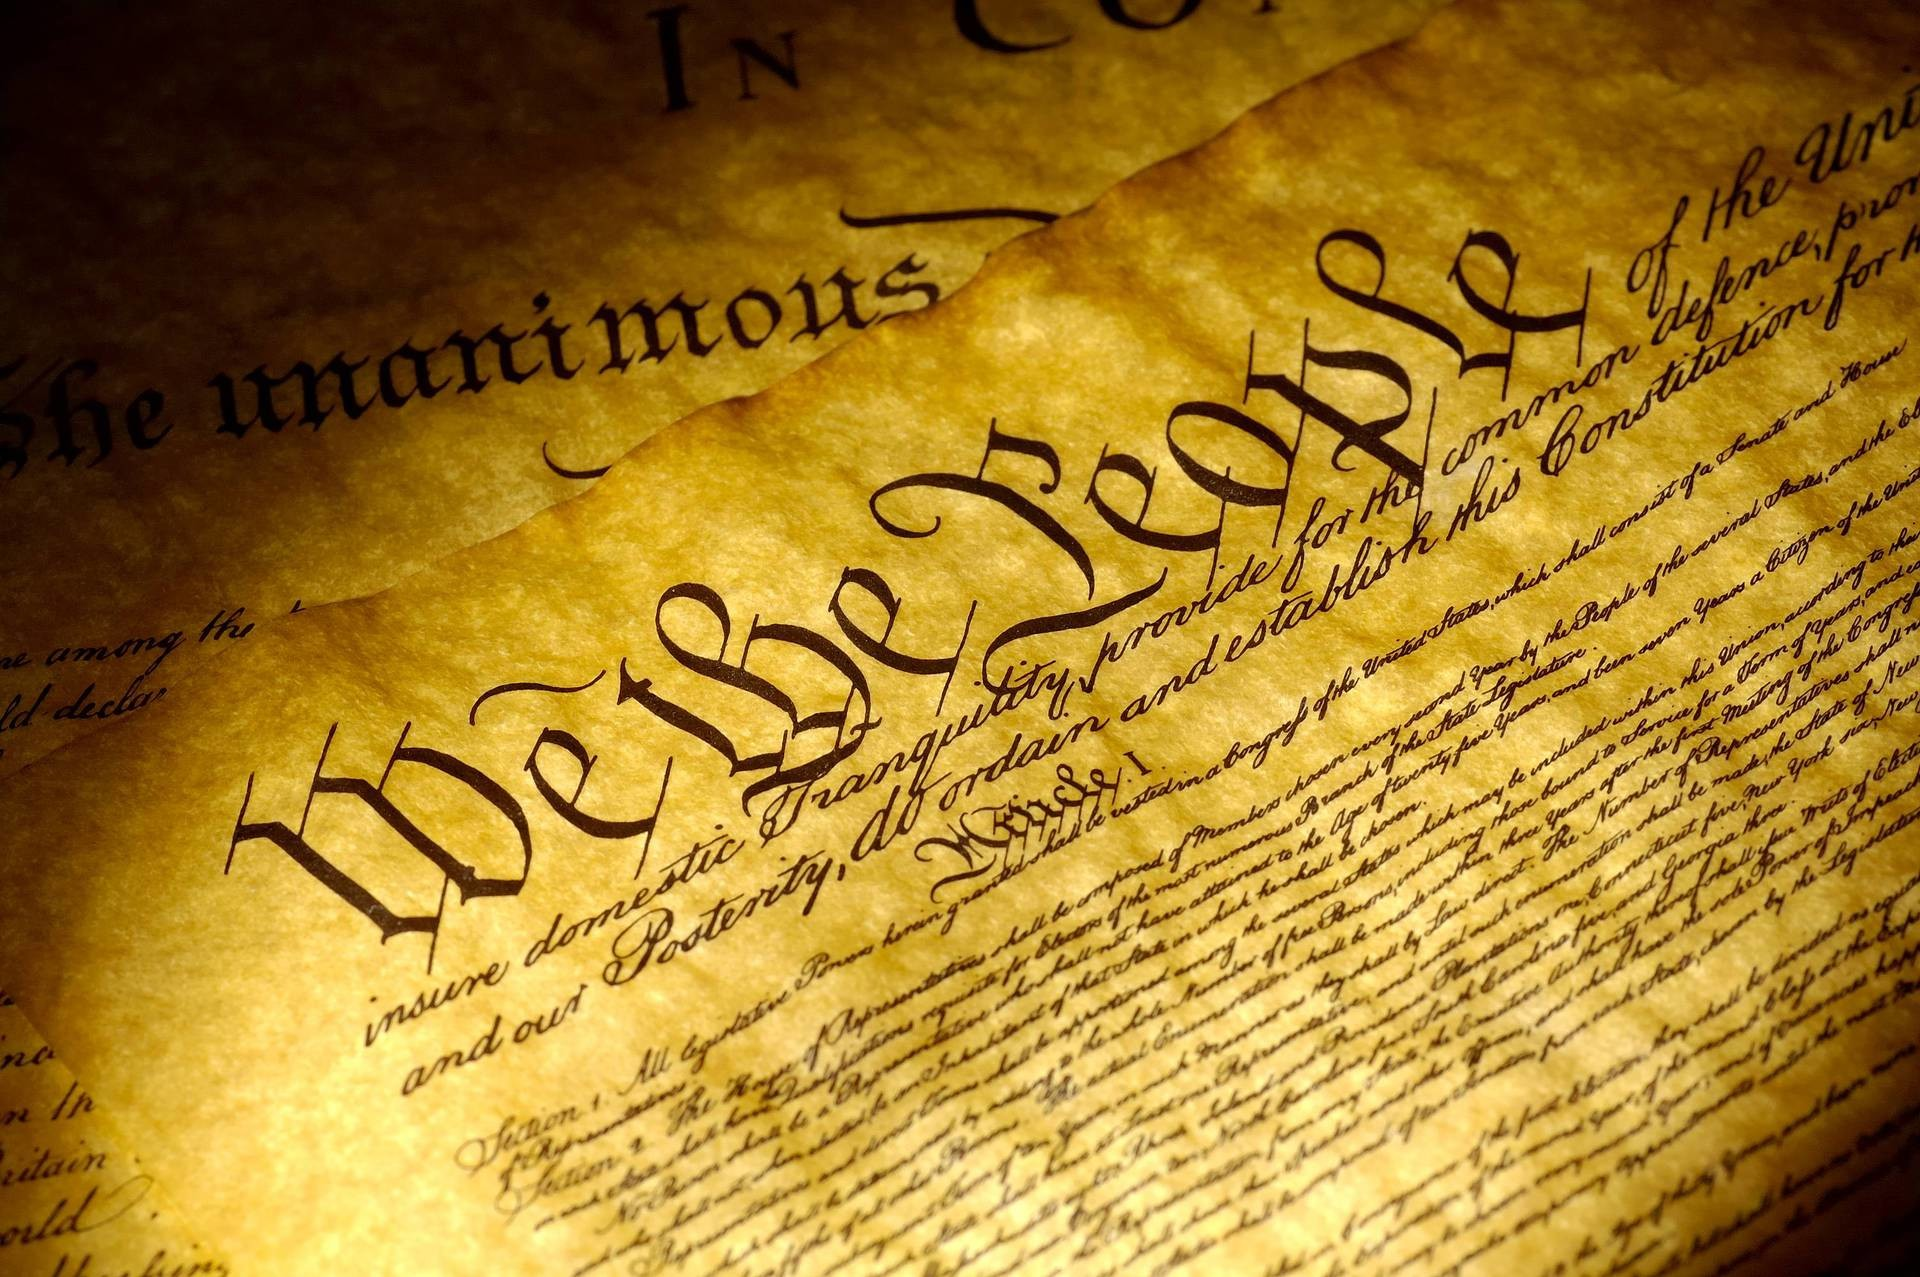 Constitutional conservative